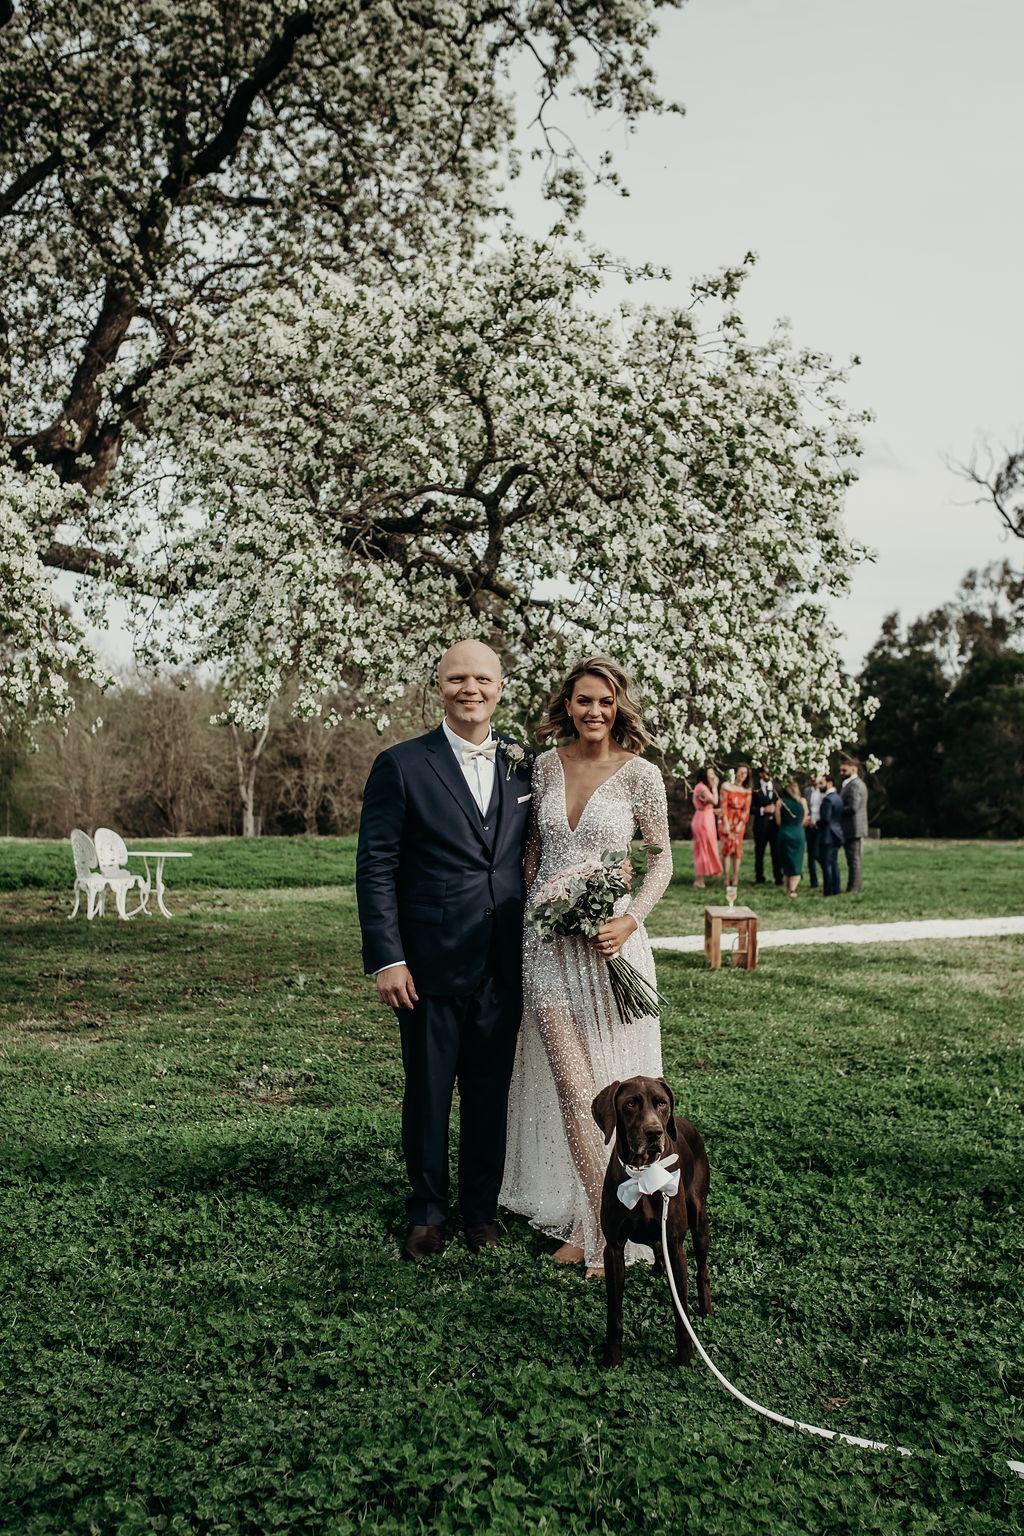 muse photography venue bridal gowns rm williams harpist makeup florals celebrant weddings